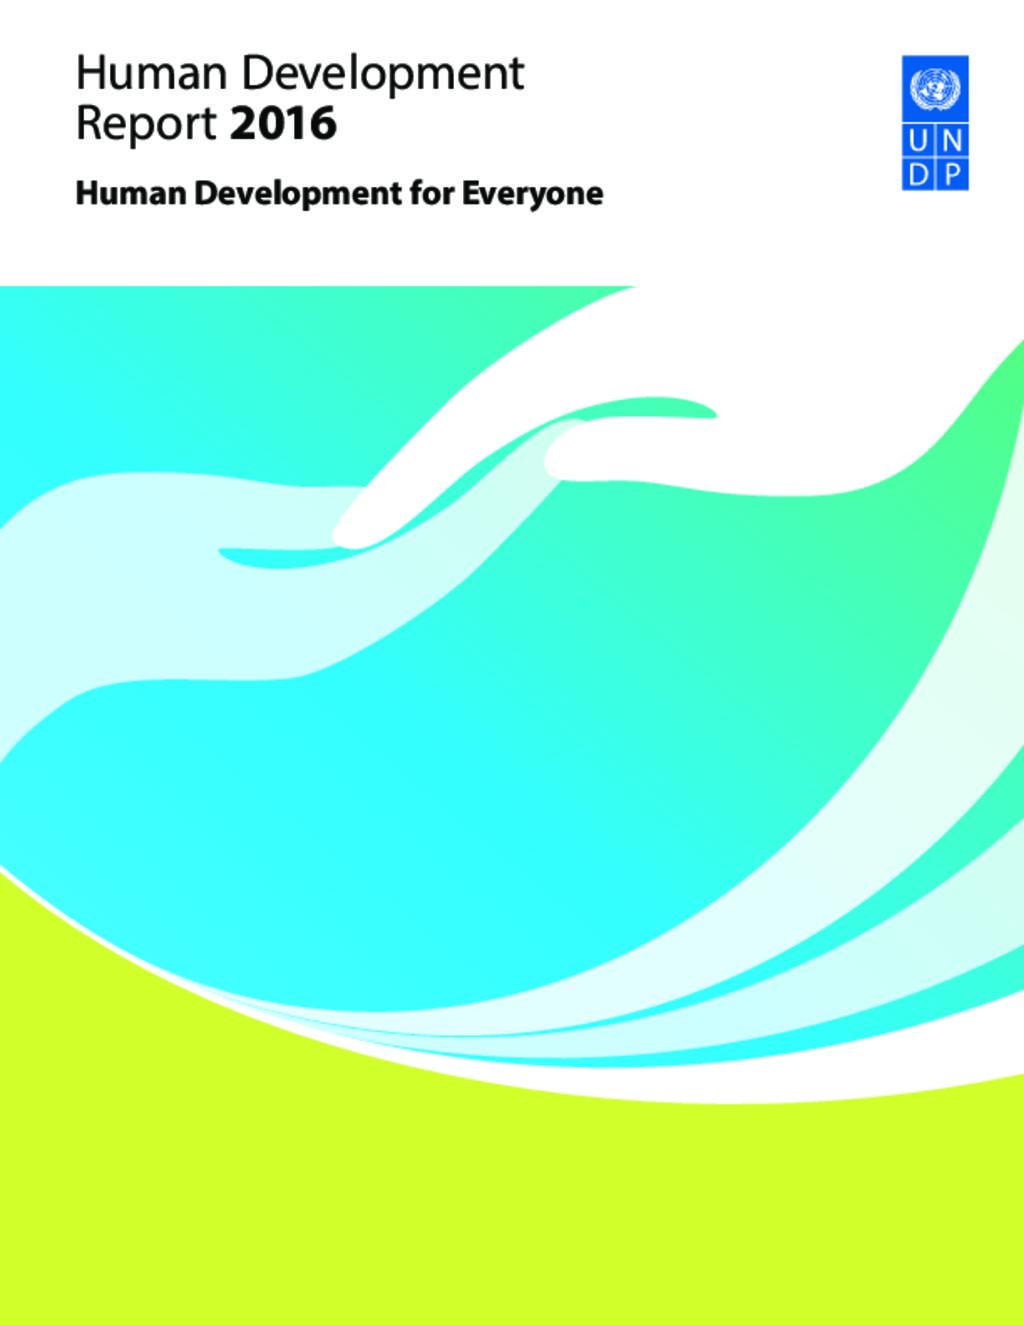 UNDP_HDI_2016